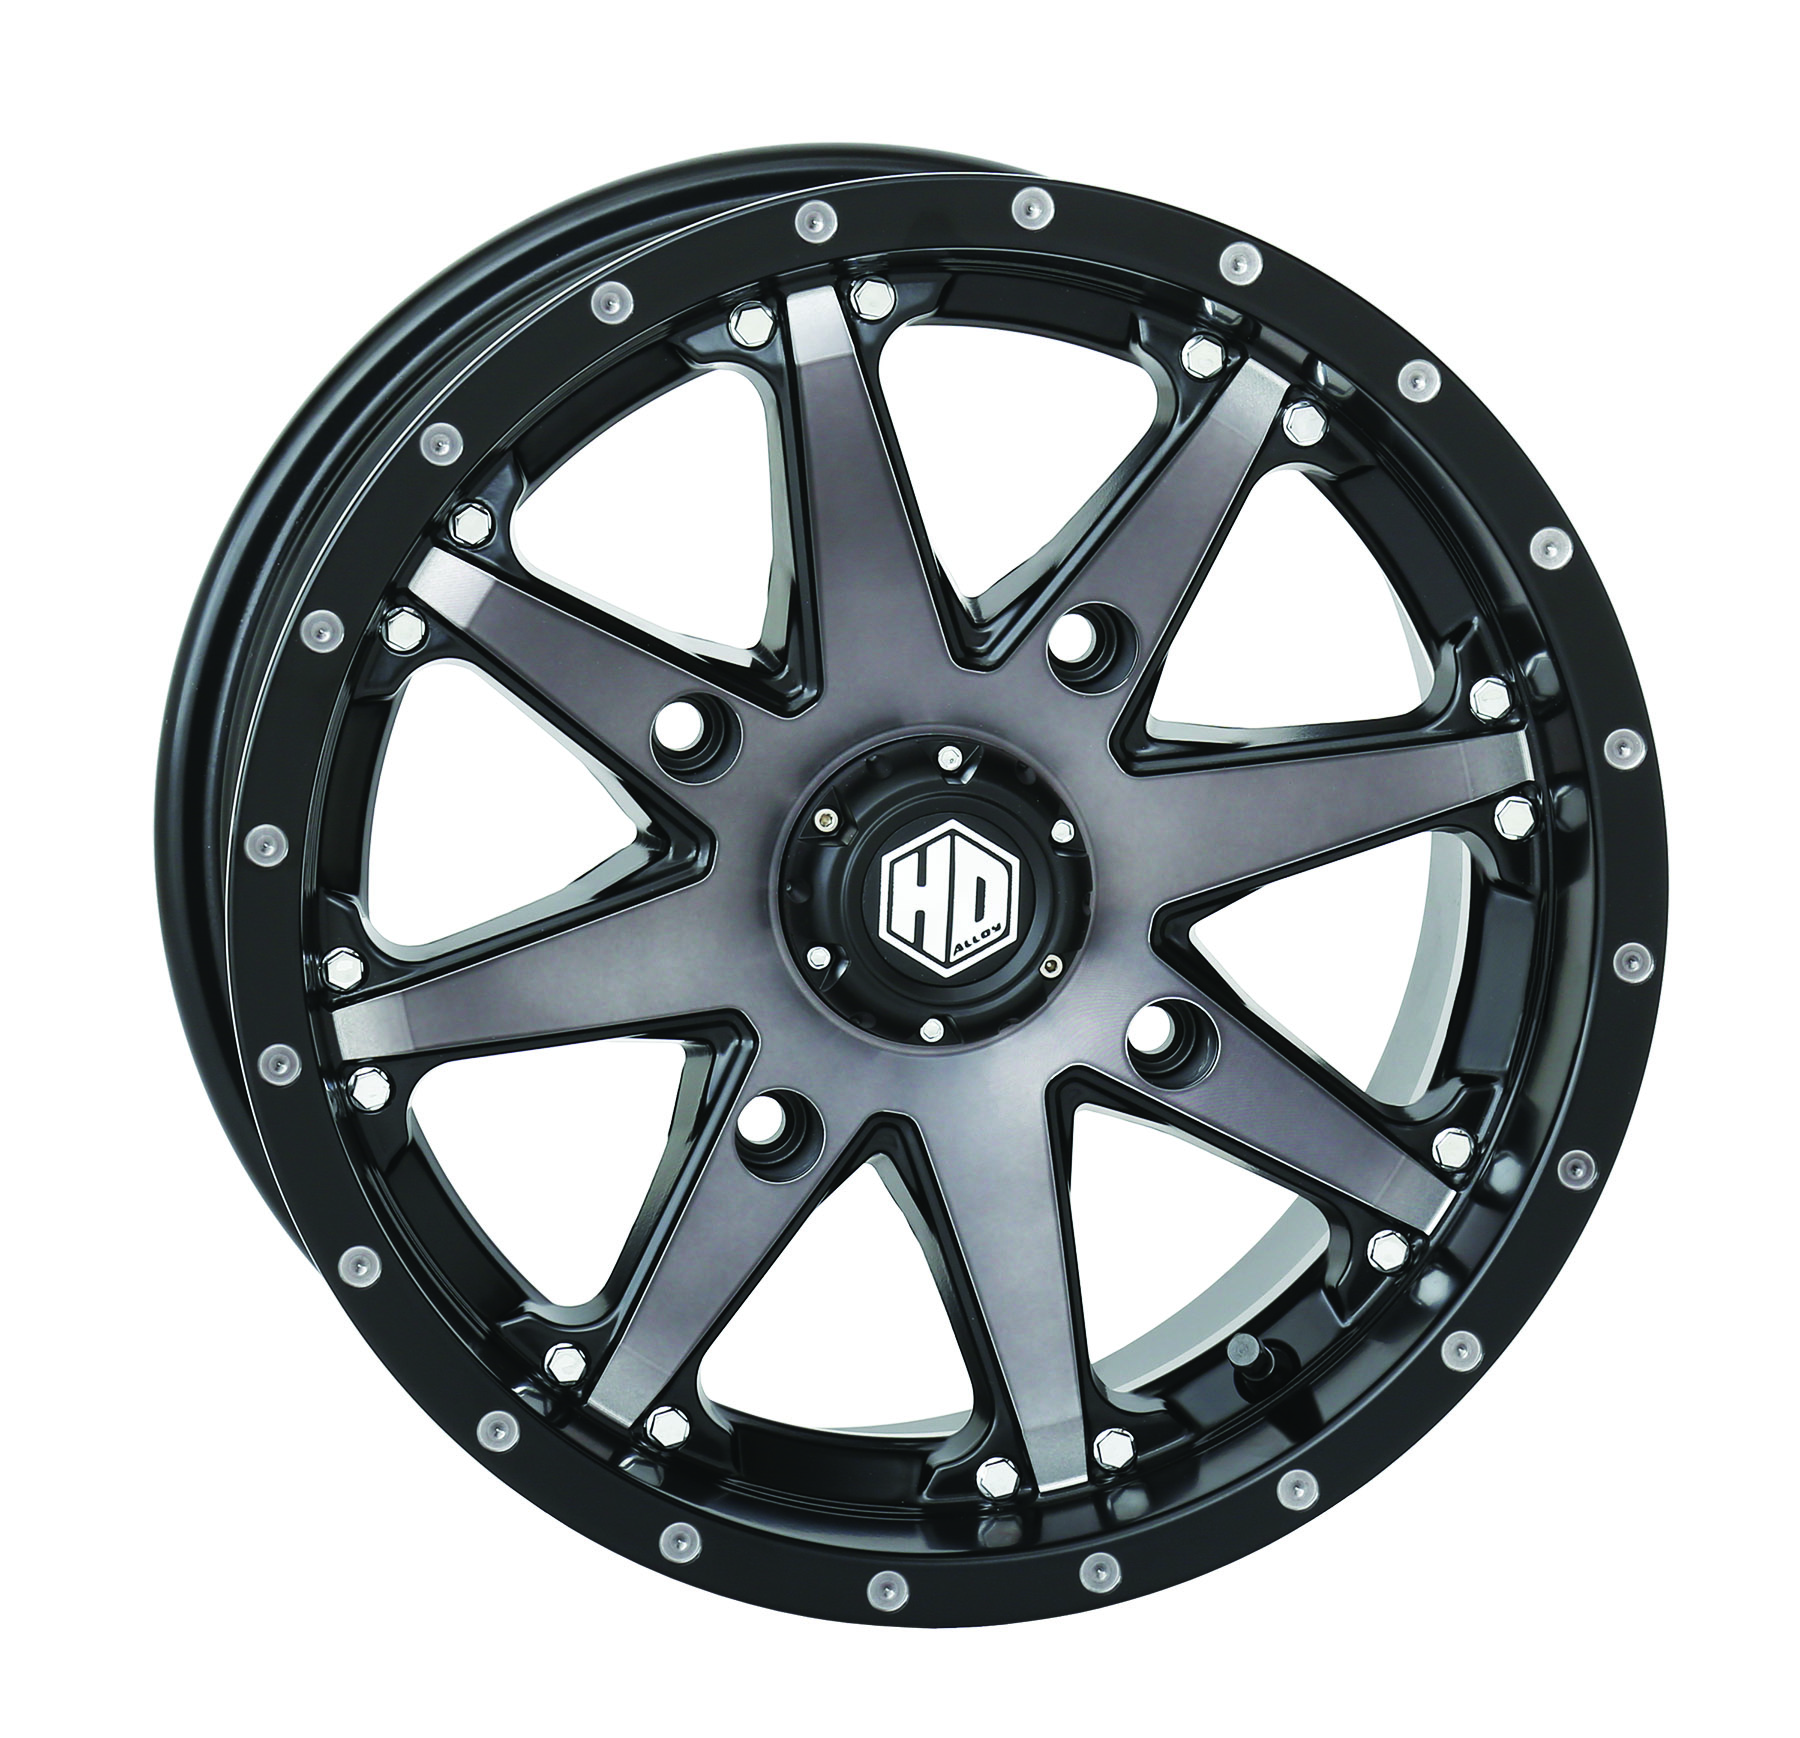 STI HD10 Wheel